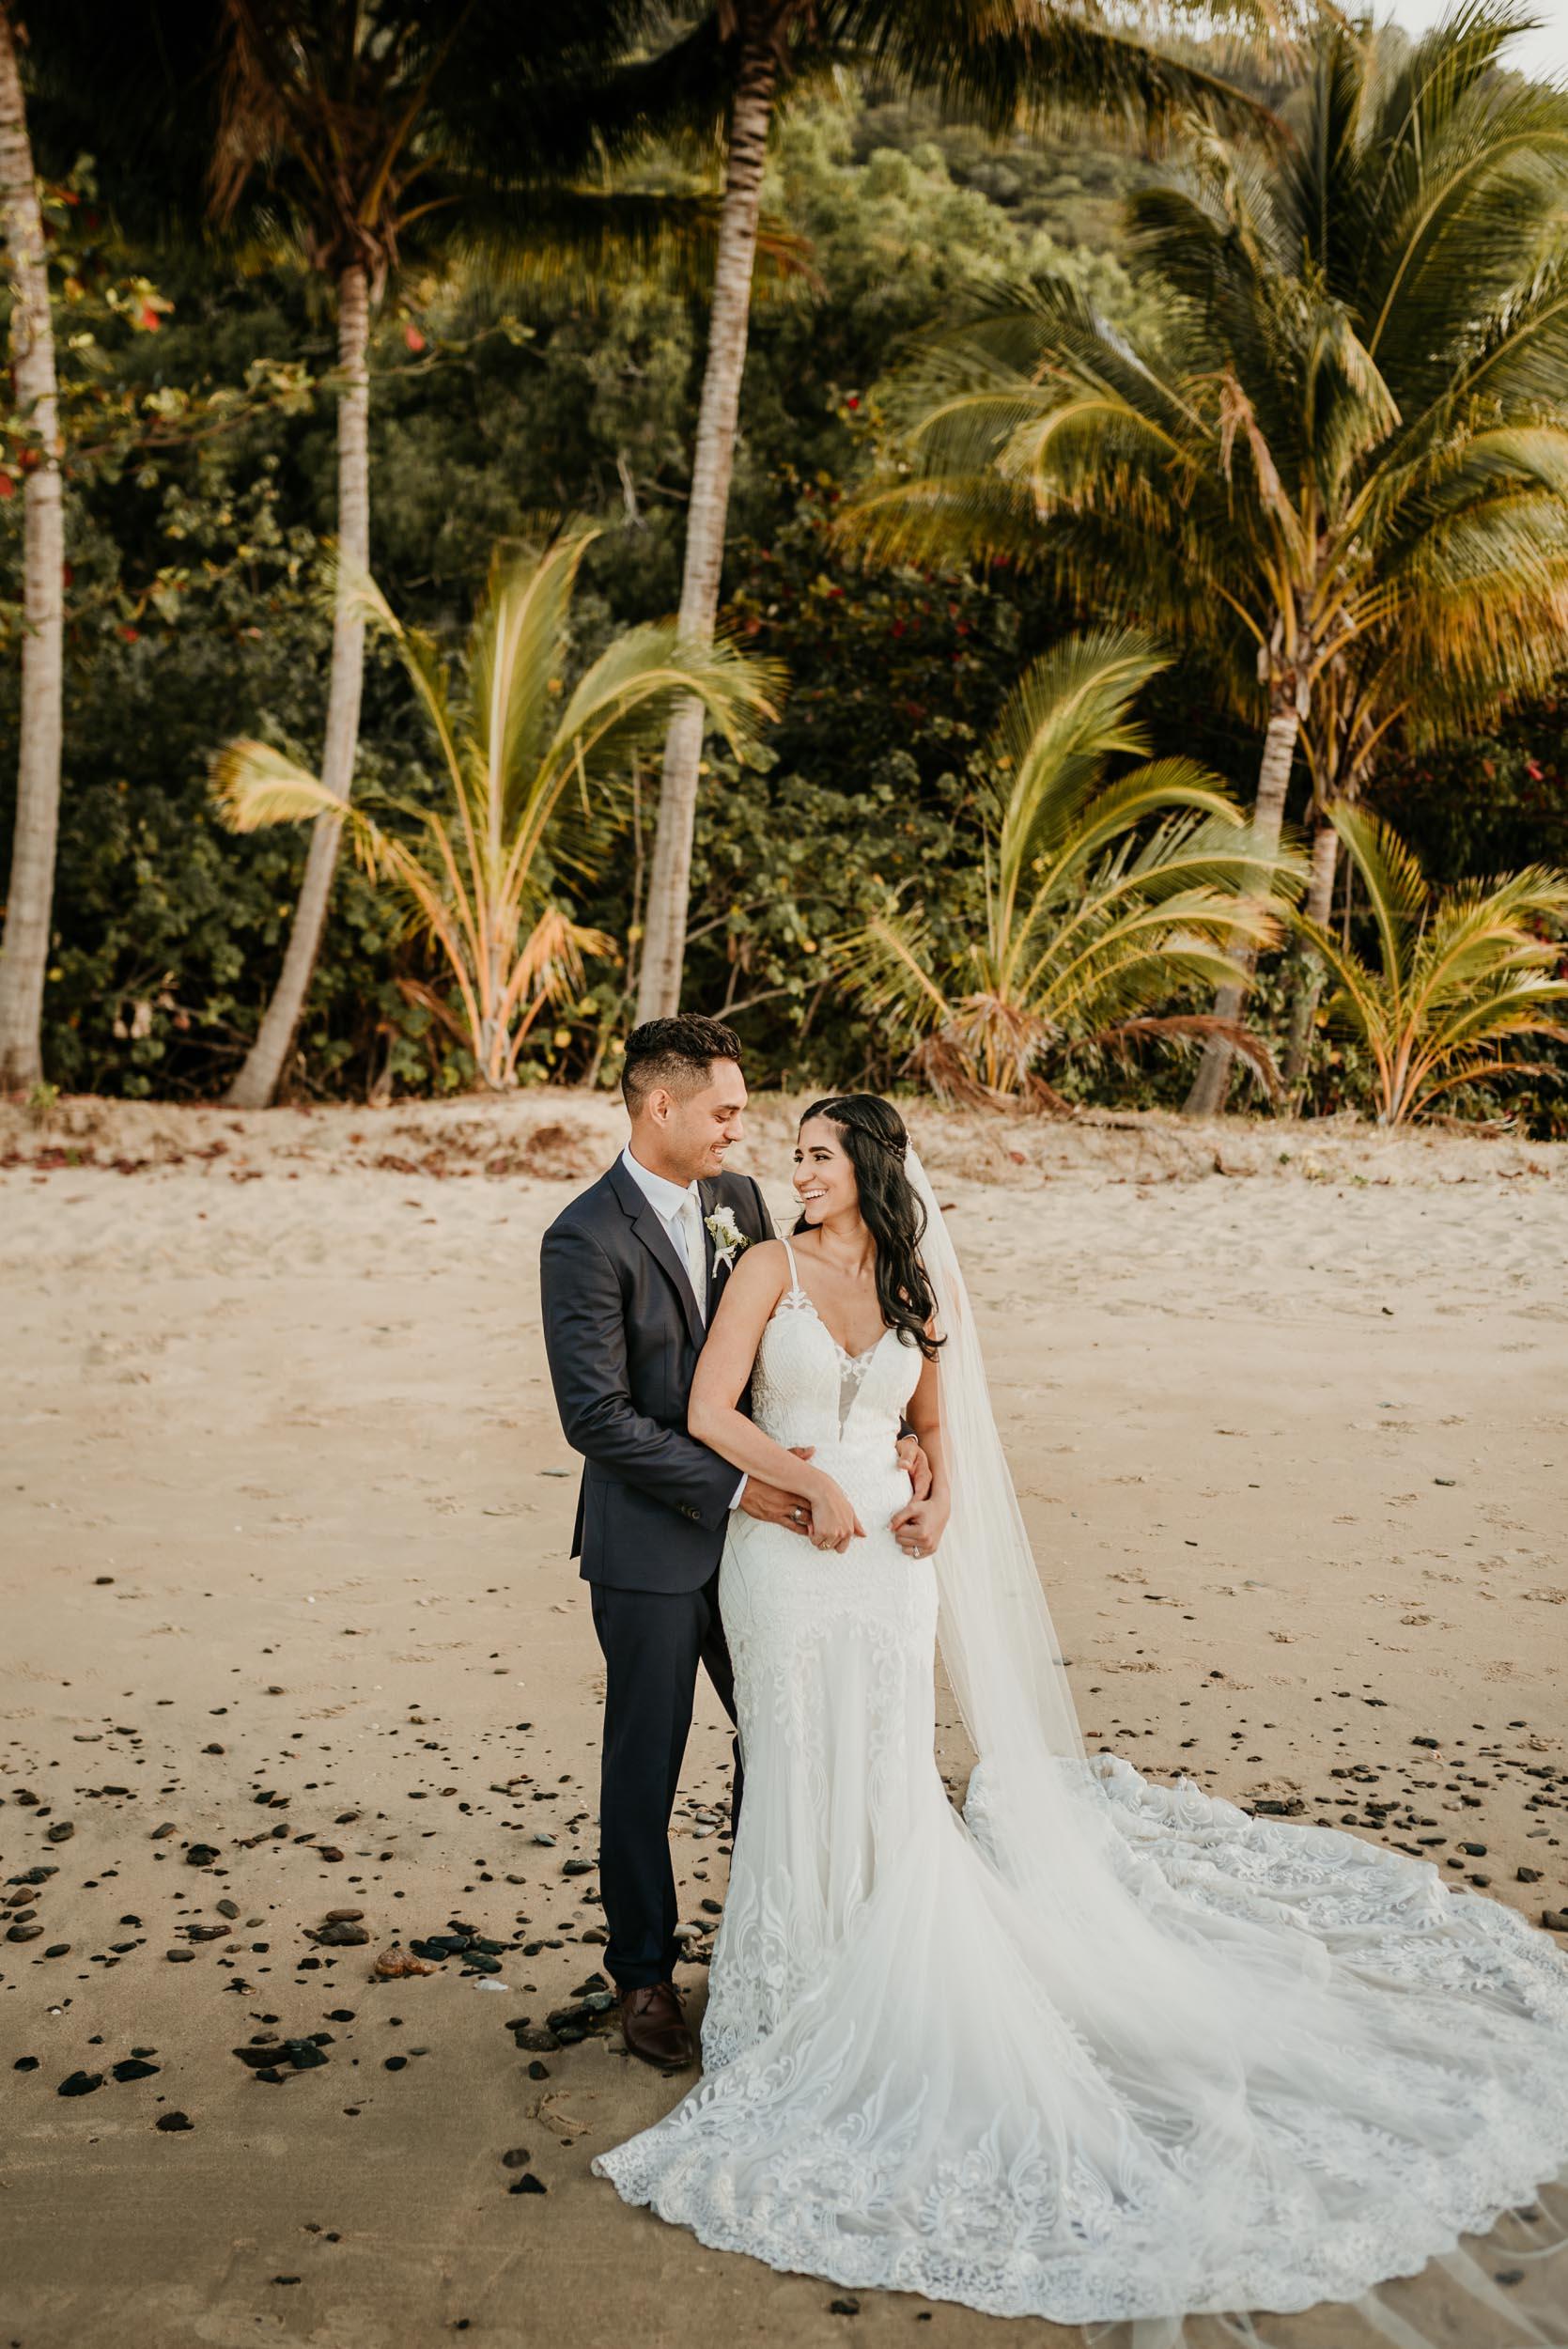 The Raw Photographer - Cairns Wedding Photographer - Beach Palm Cove Ceremony - Dress Irene Costa's Devine Bridal - Queensland-54.jpg